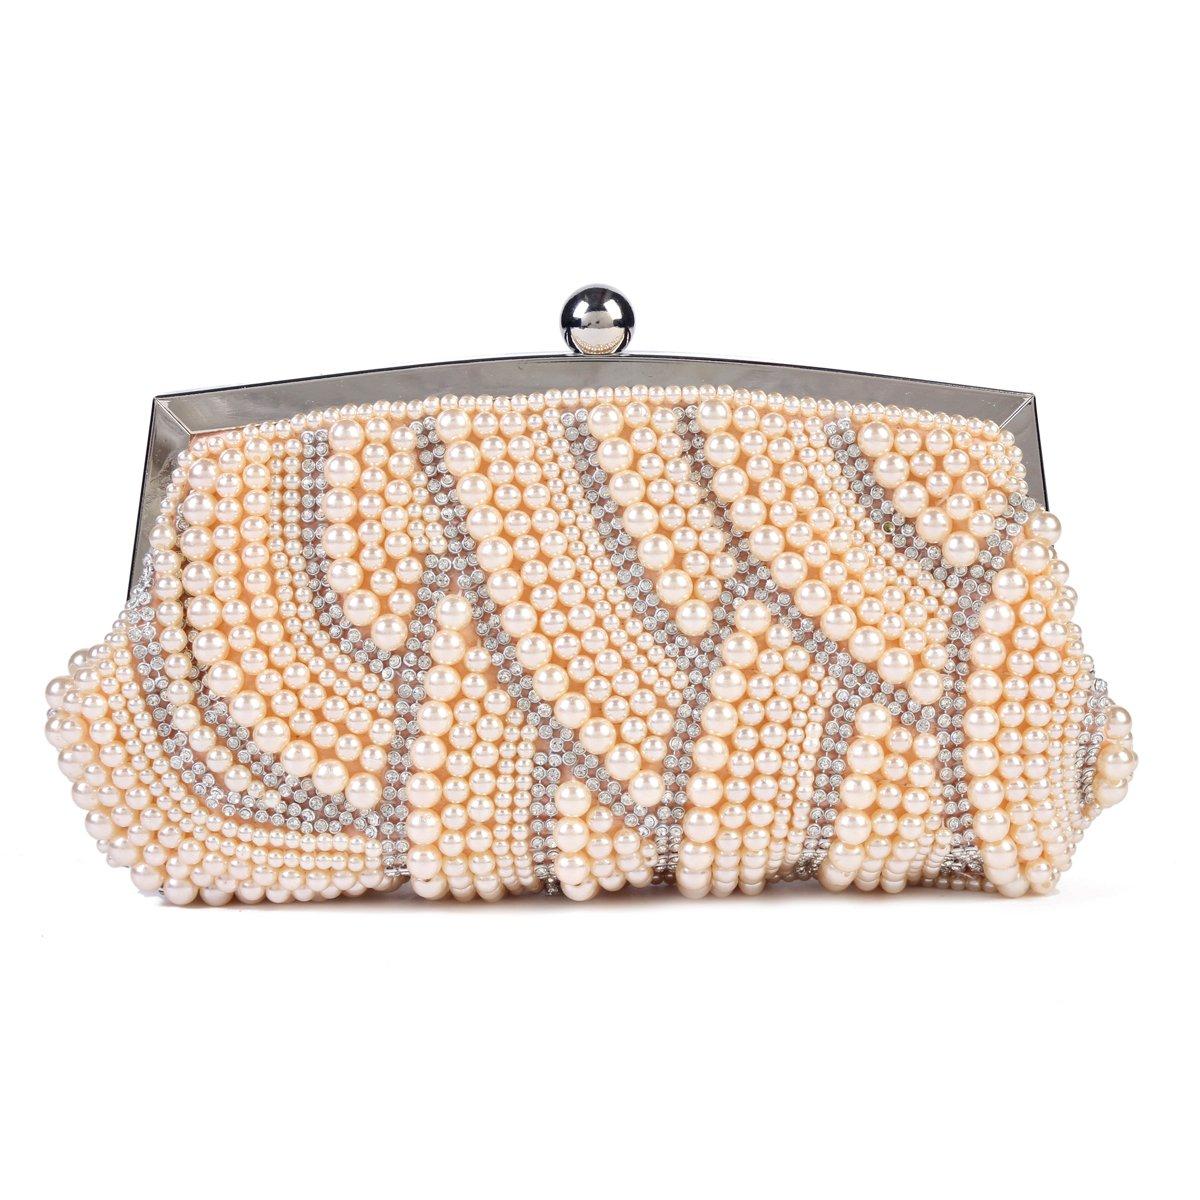 Damara Womens Exquisite Pearl Crystal Clutch Evening Shoulder Bag,Champagne